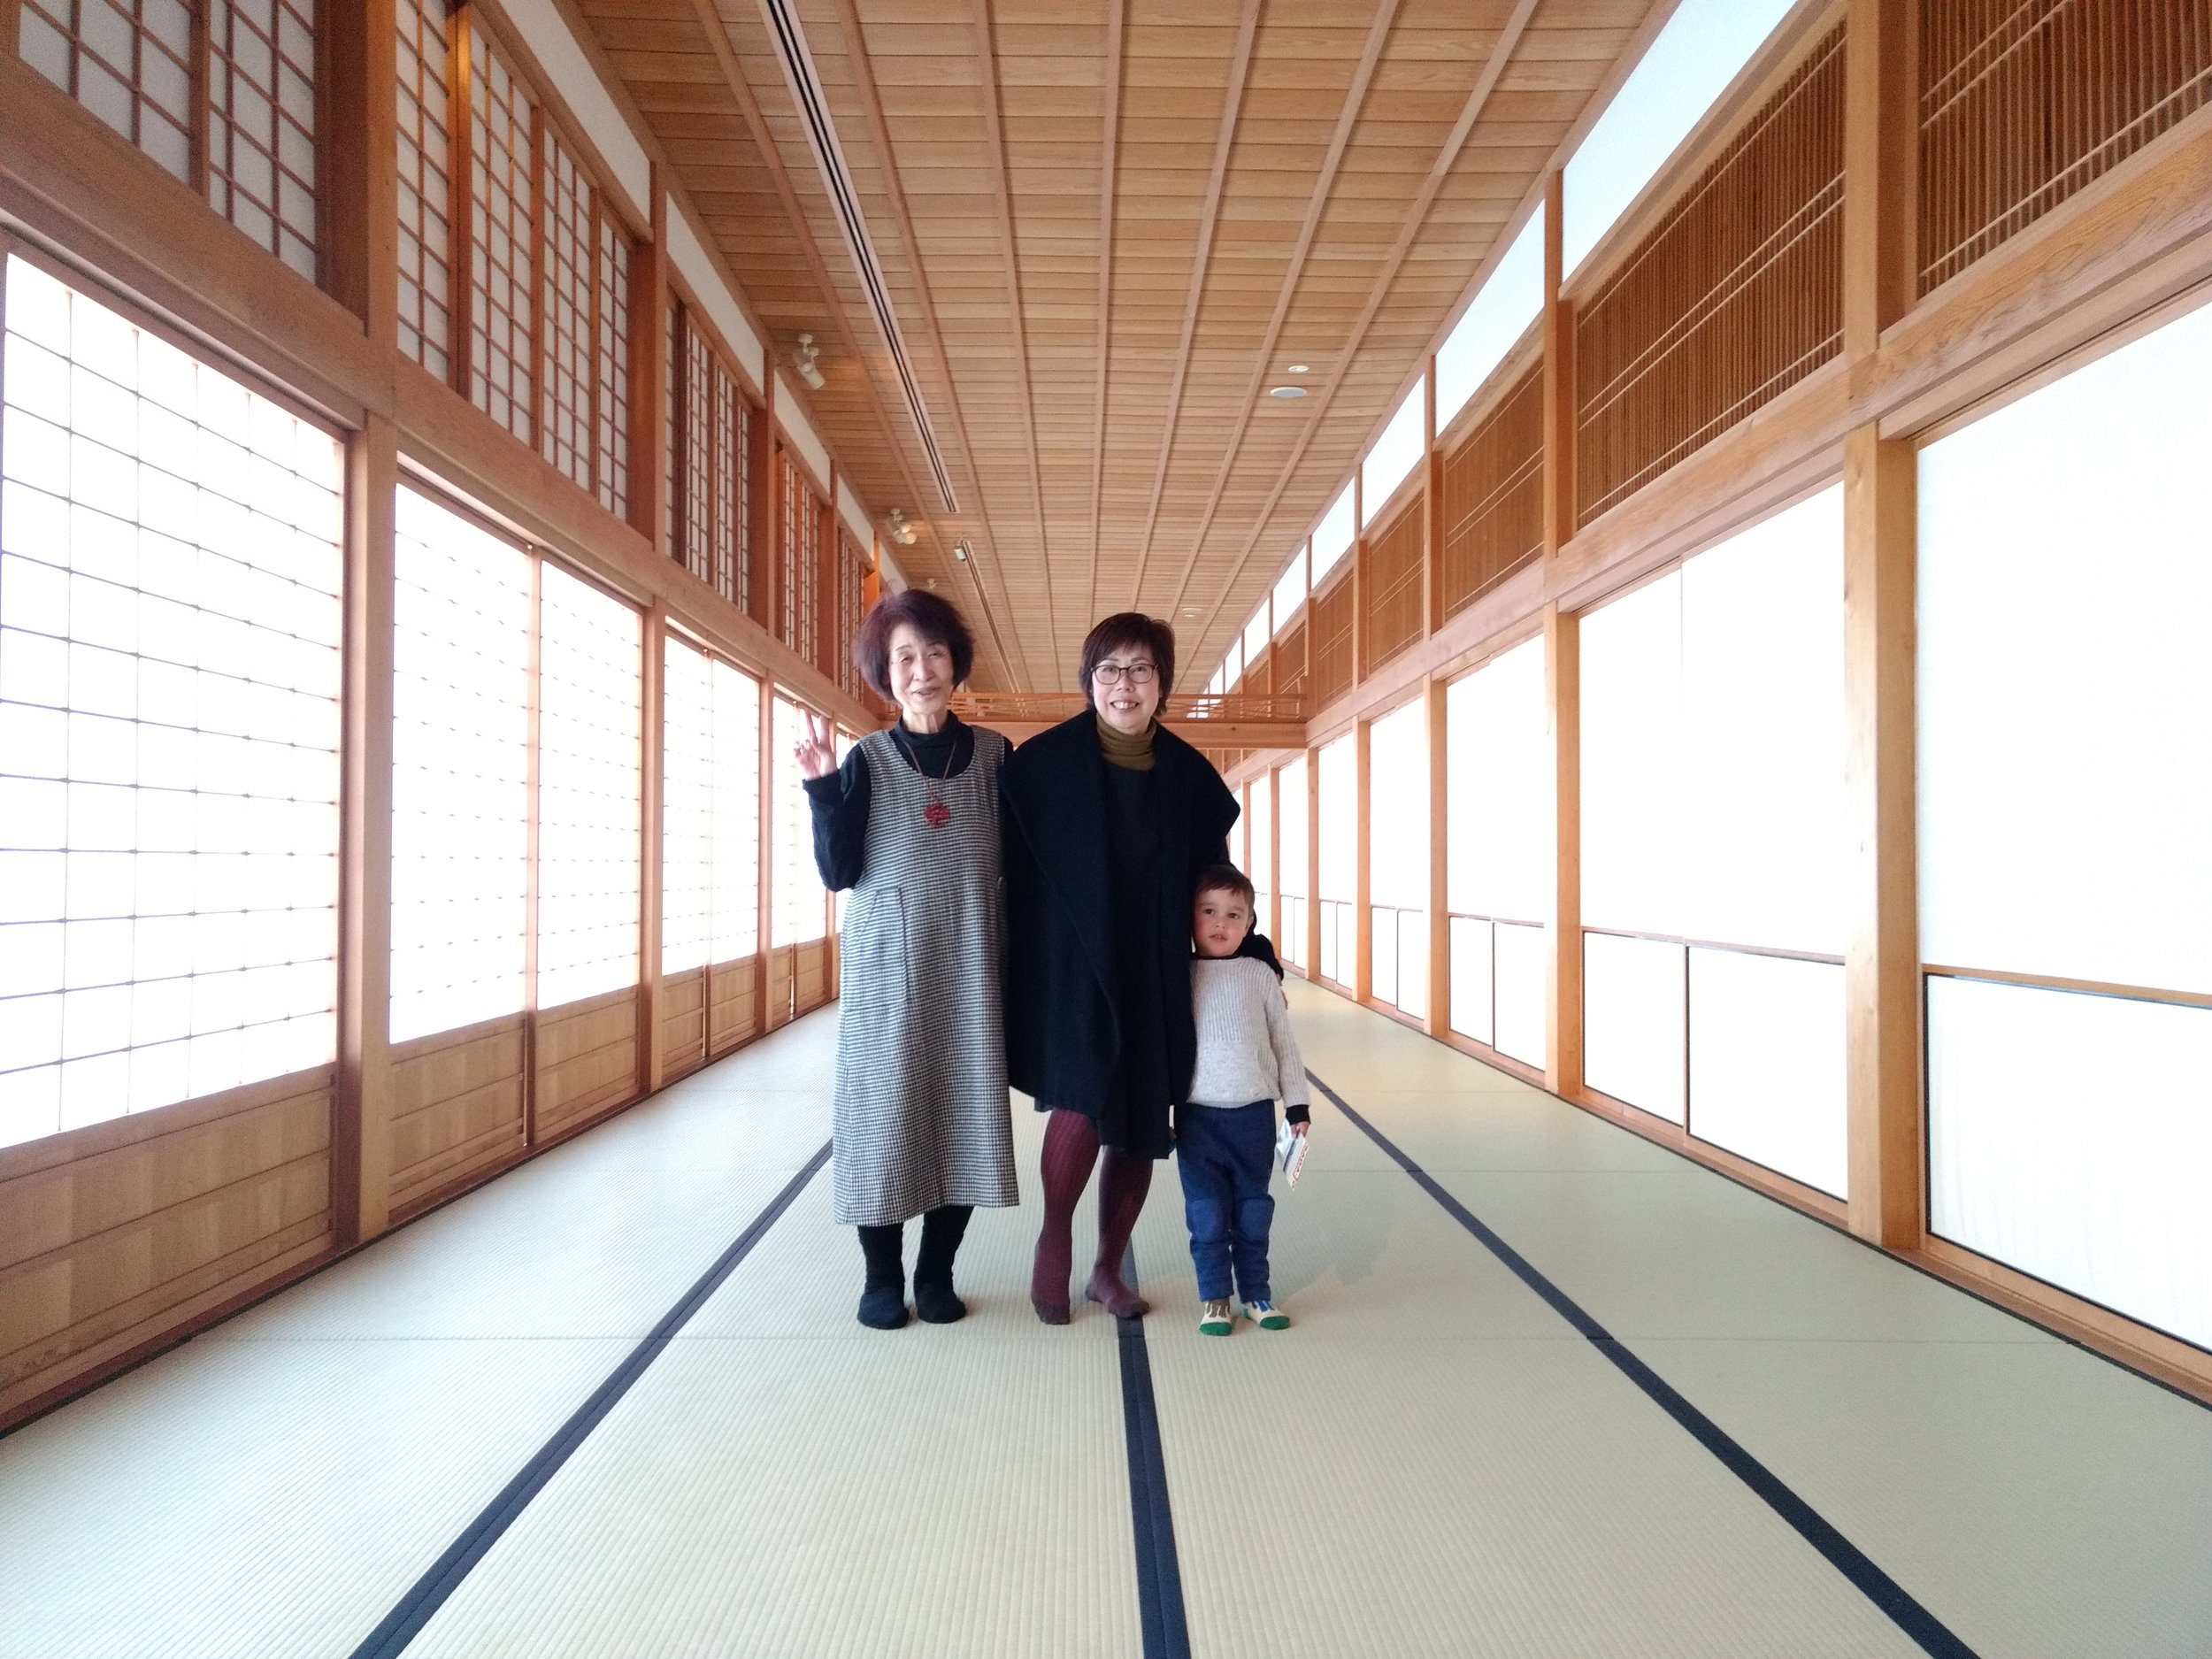 Saga Castle (Sachiko in the left)